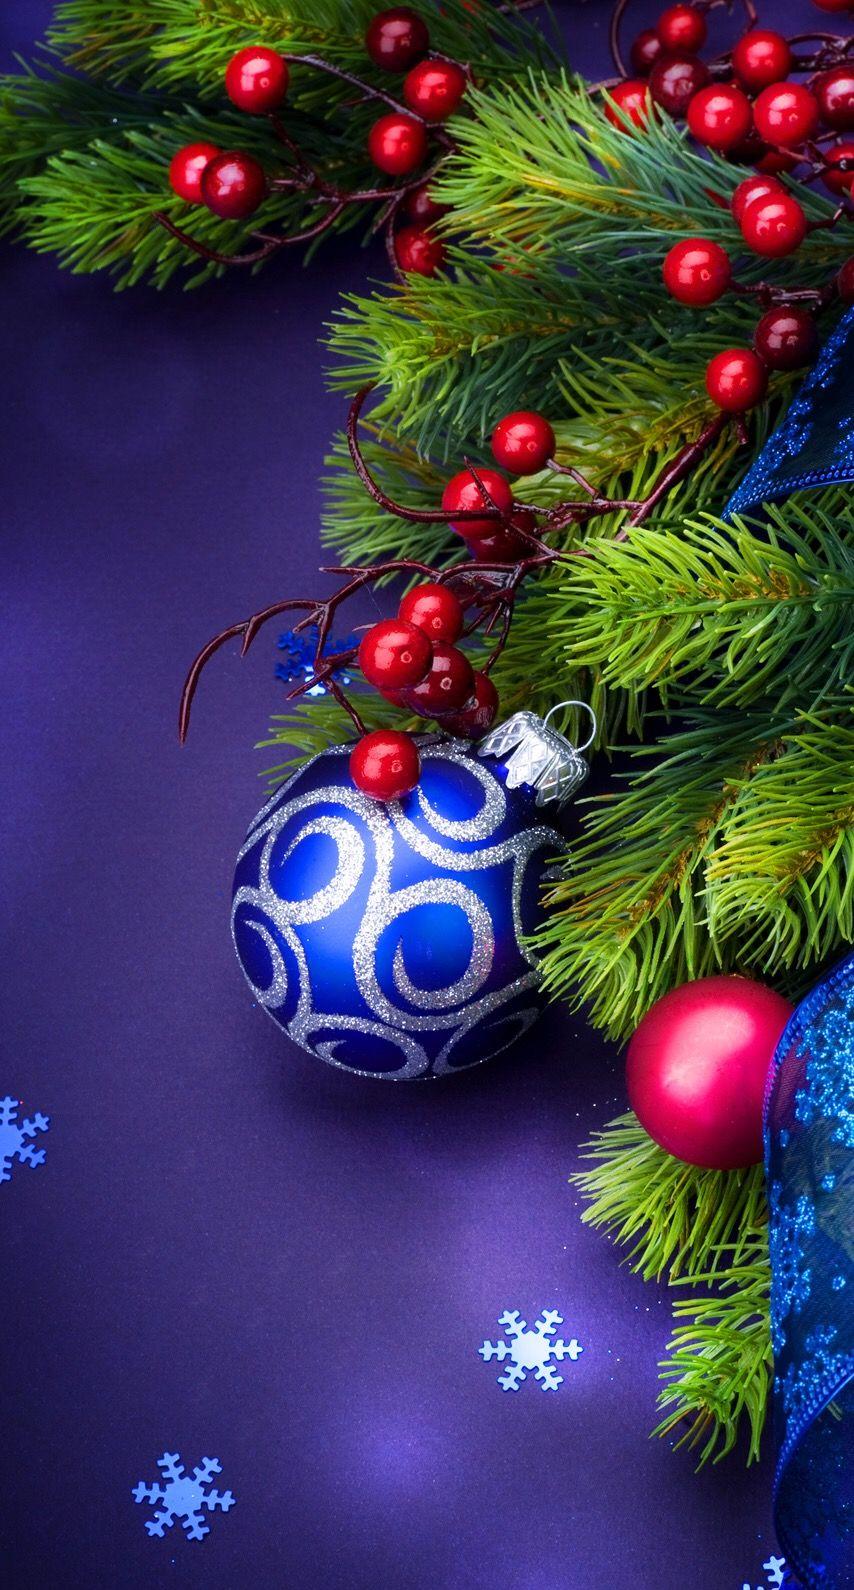 Pin By оксана кулинич On обои Christmas Desktop Christmas